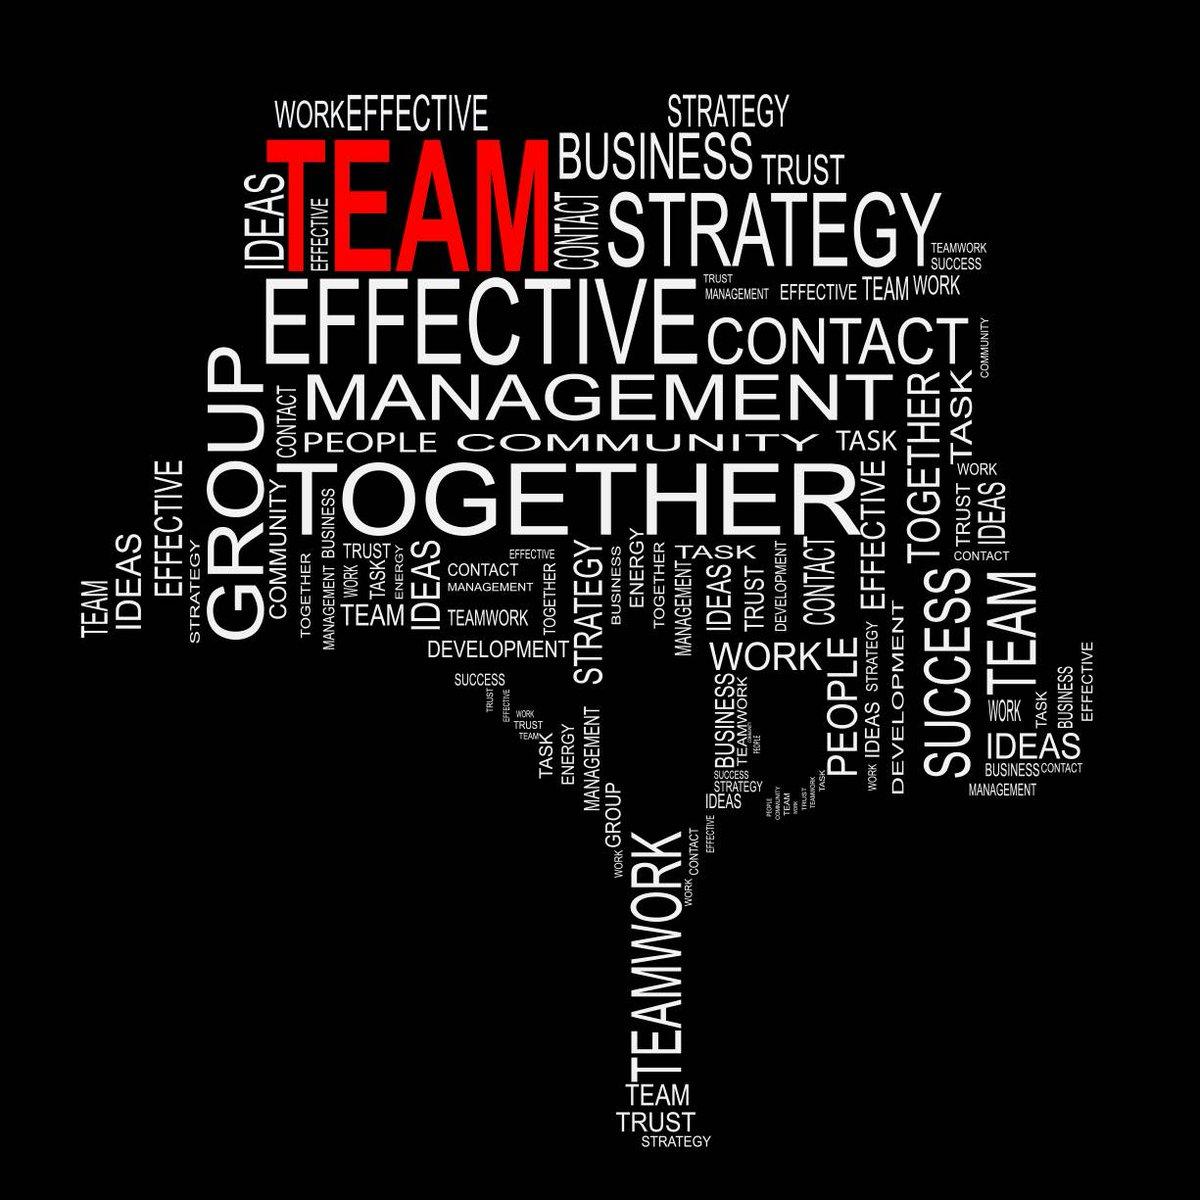 Cd Logistics On Twitter Talent Wins Games But Teamwork And